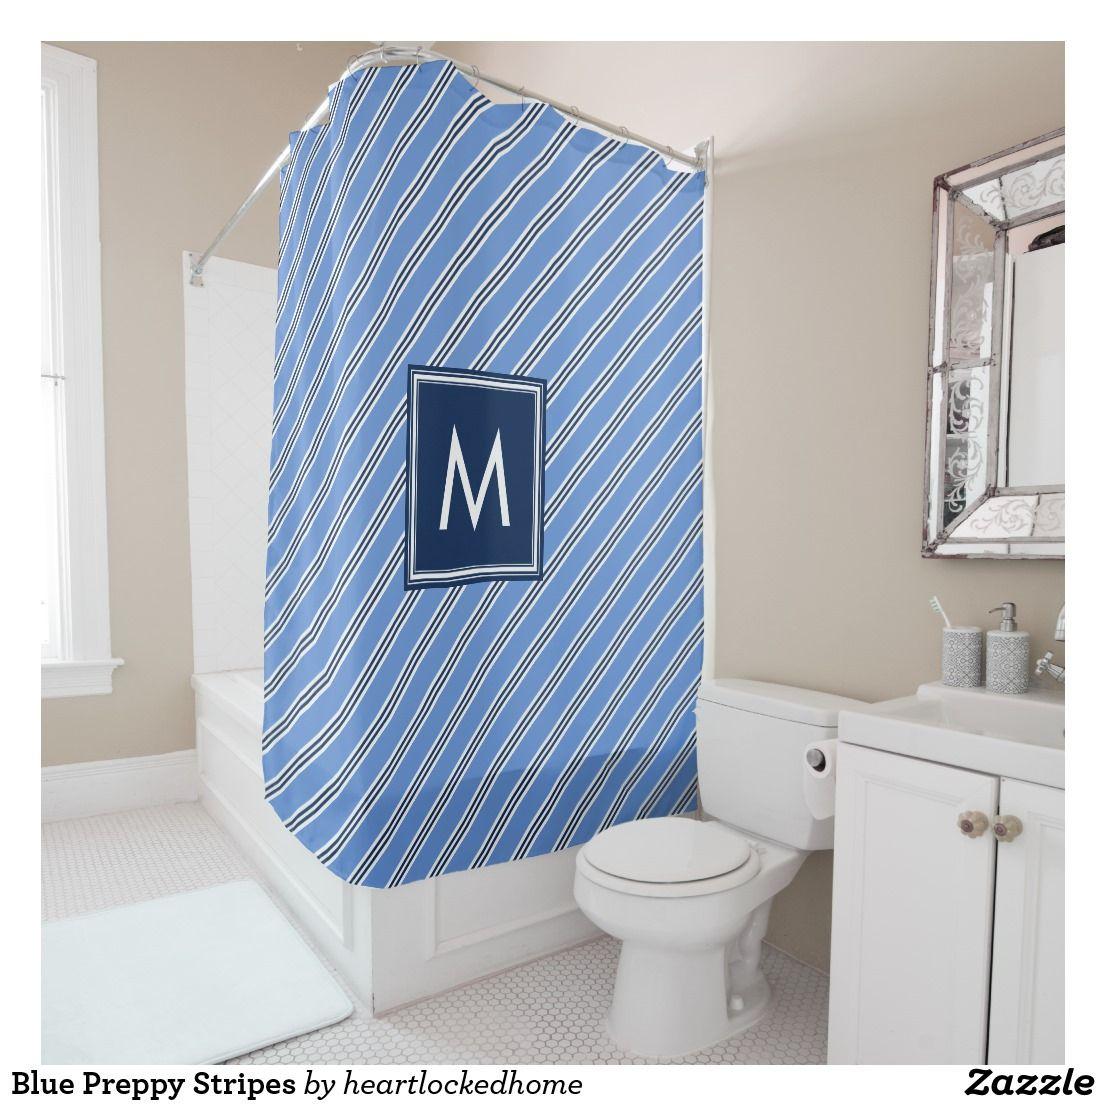 Blue Preppy Stripes Shower Curtain | Bath:Shower Curtains ...